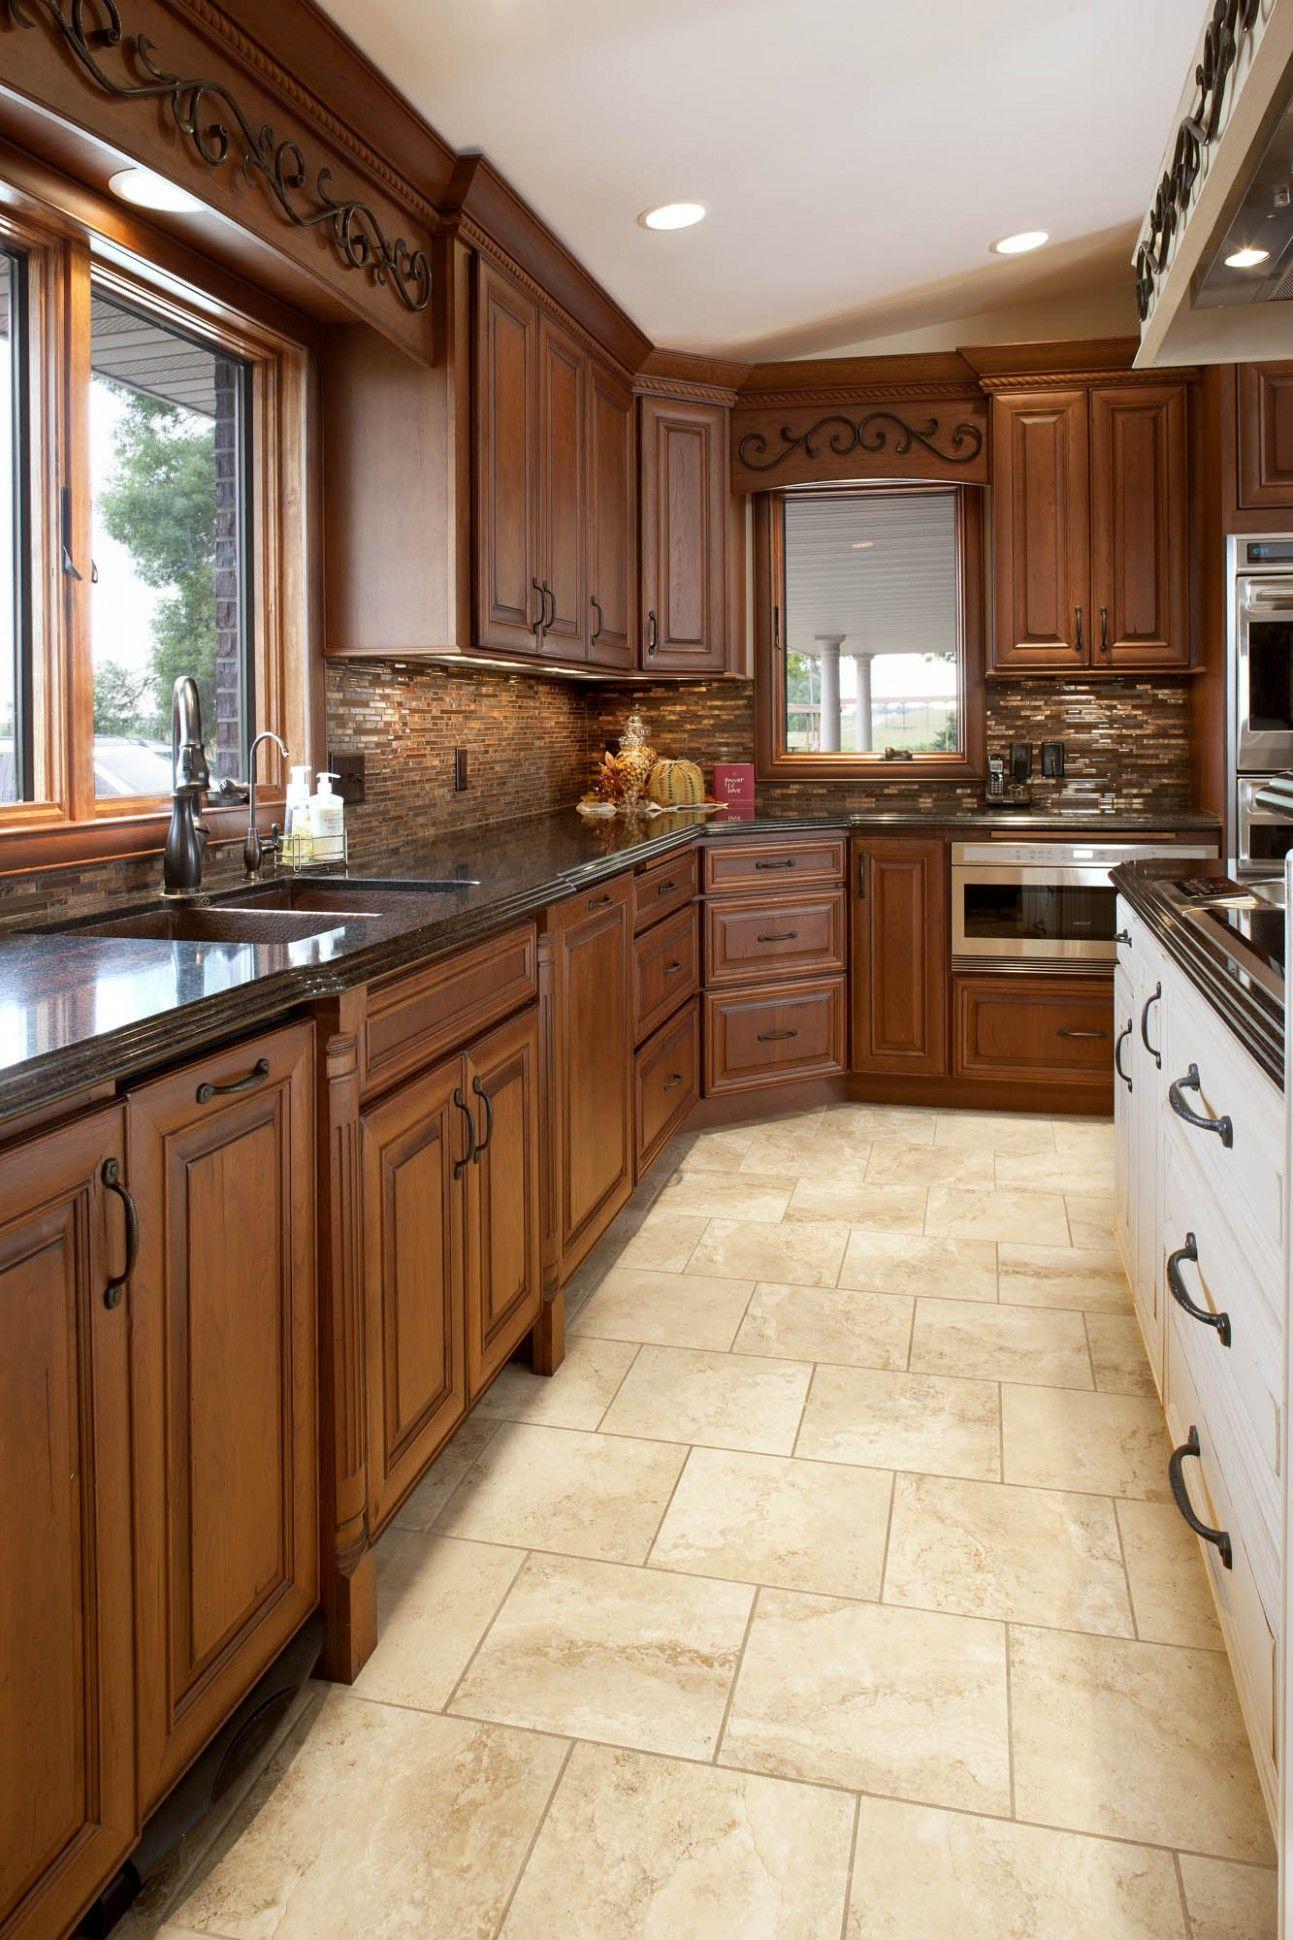 Heartland Kitchen Cabinets Kitchen Furniture Design Tuscan Kitchen Kitchen Cabinet Design